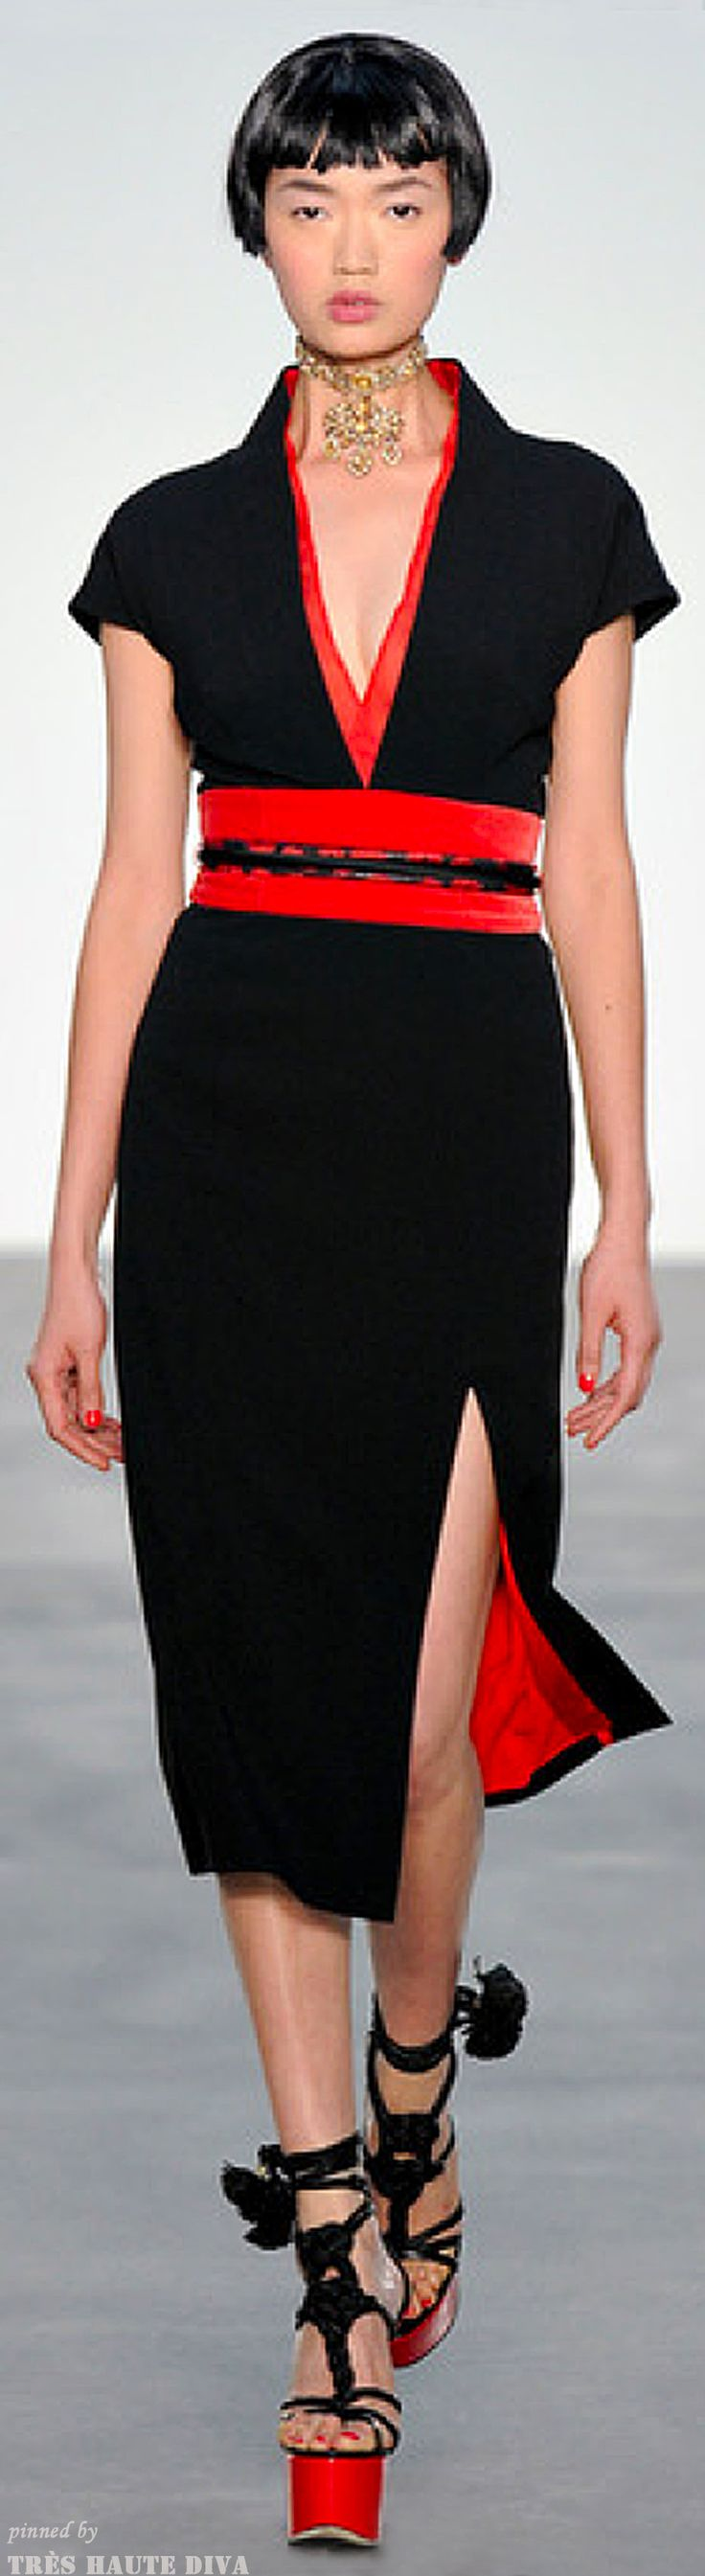 #London FW L'Wren Scott Sring 2014 RTW http://www.style.com/fashionshows/<3